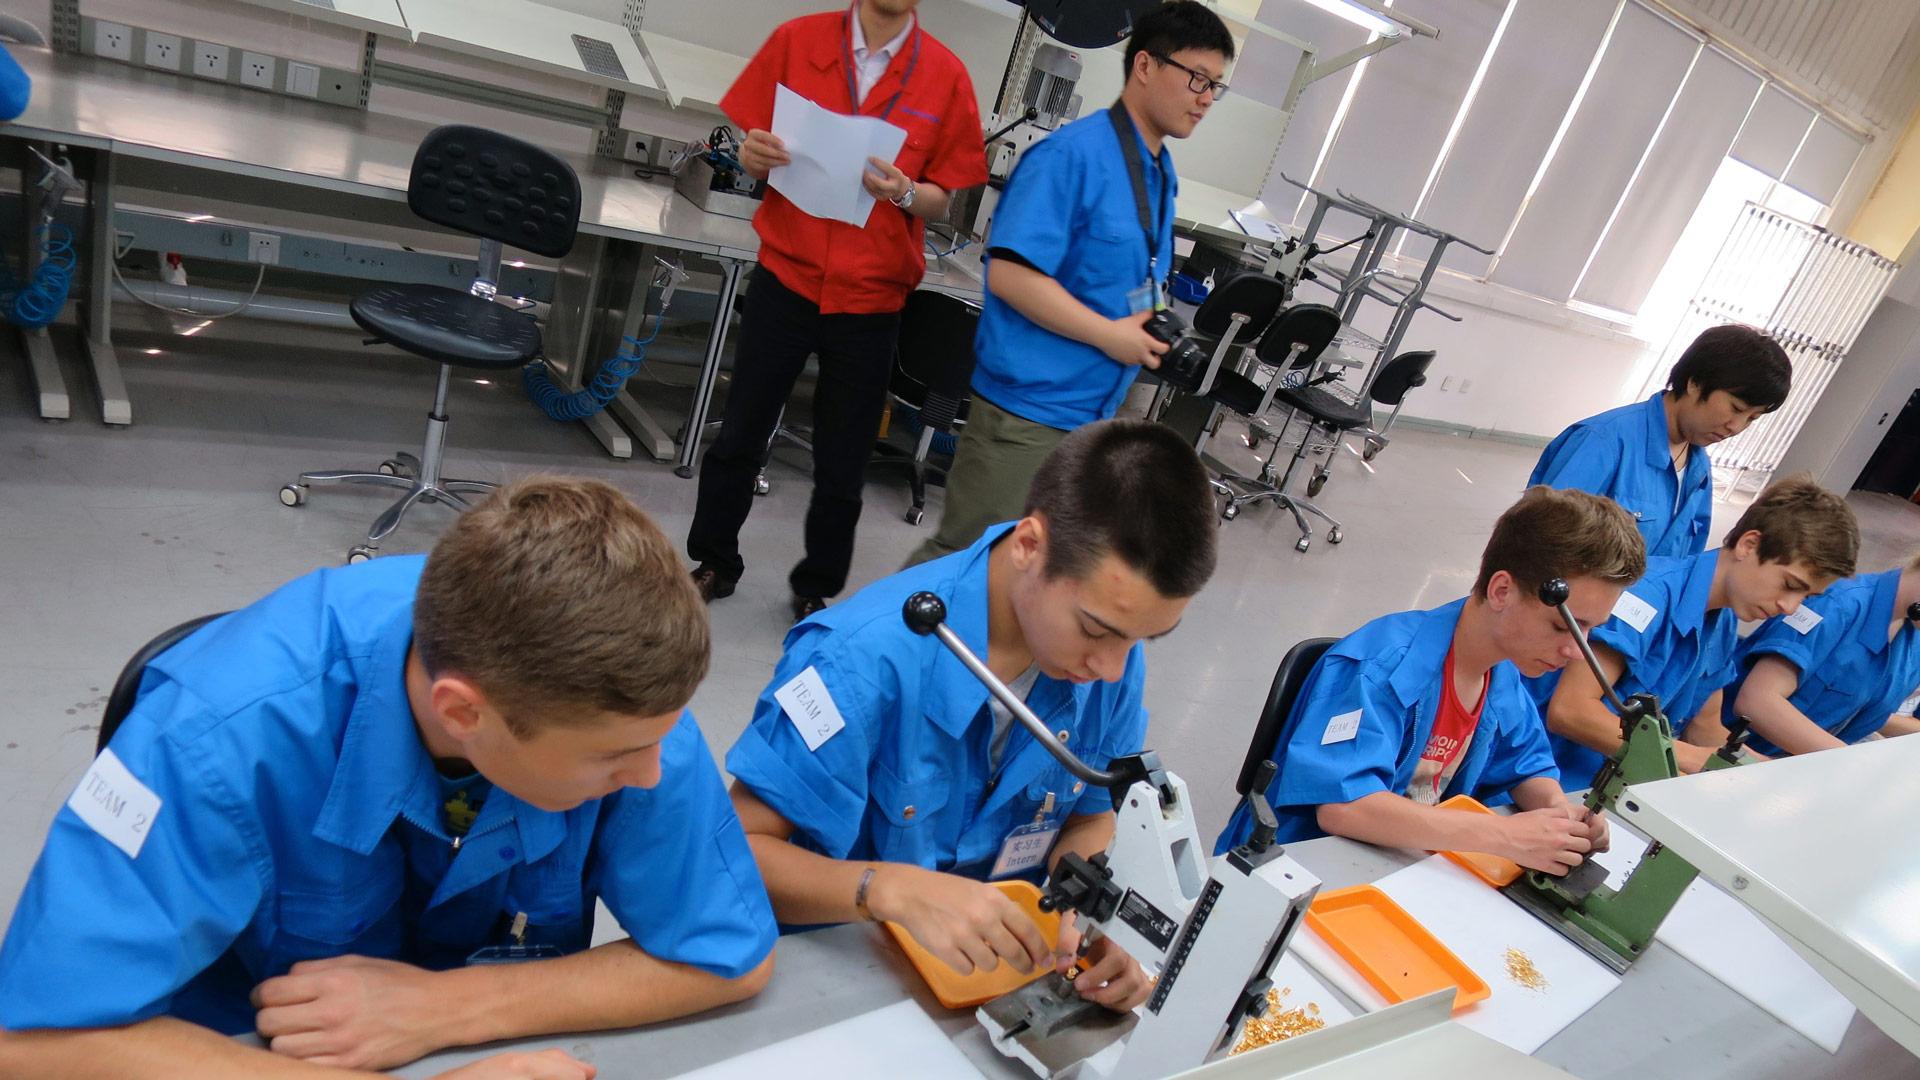 Schülerpraktikum in Peking – Workshop Umweltschutz in Industrieunternehmen in Nanjing